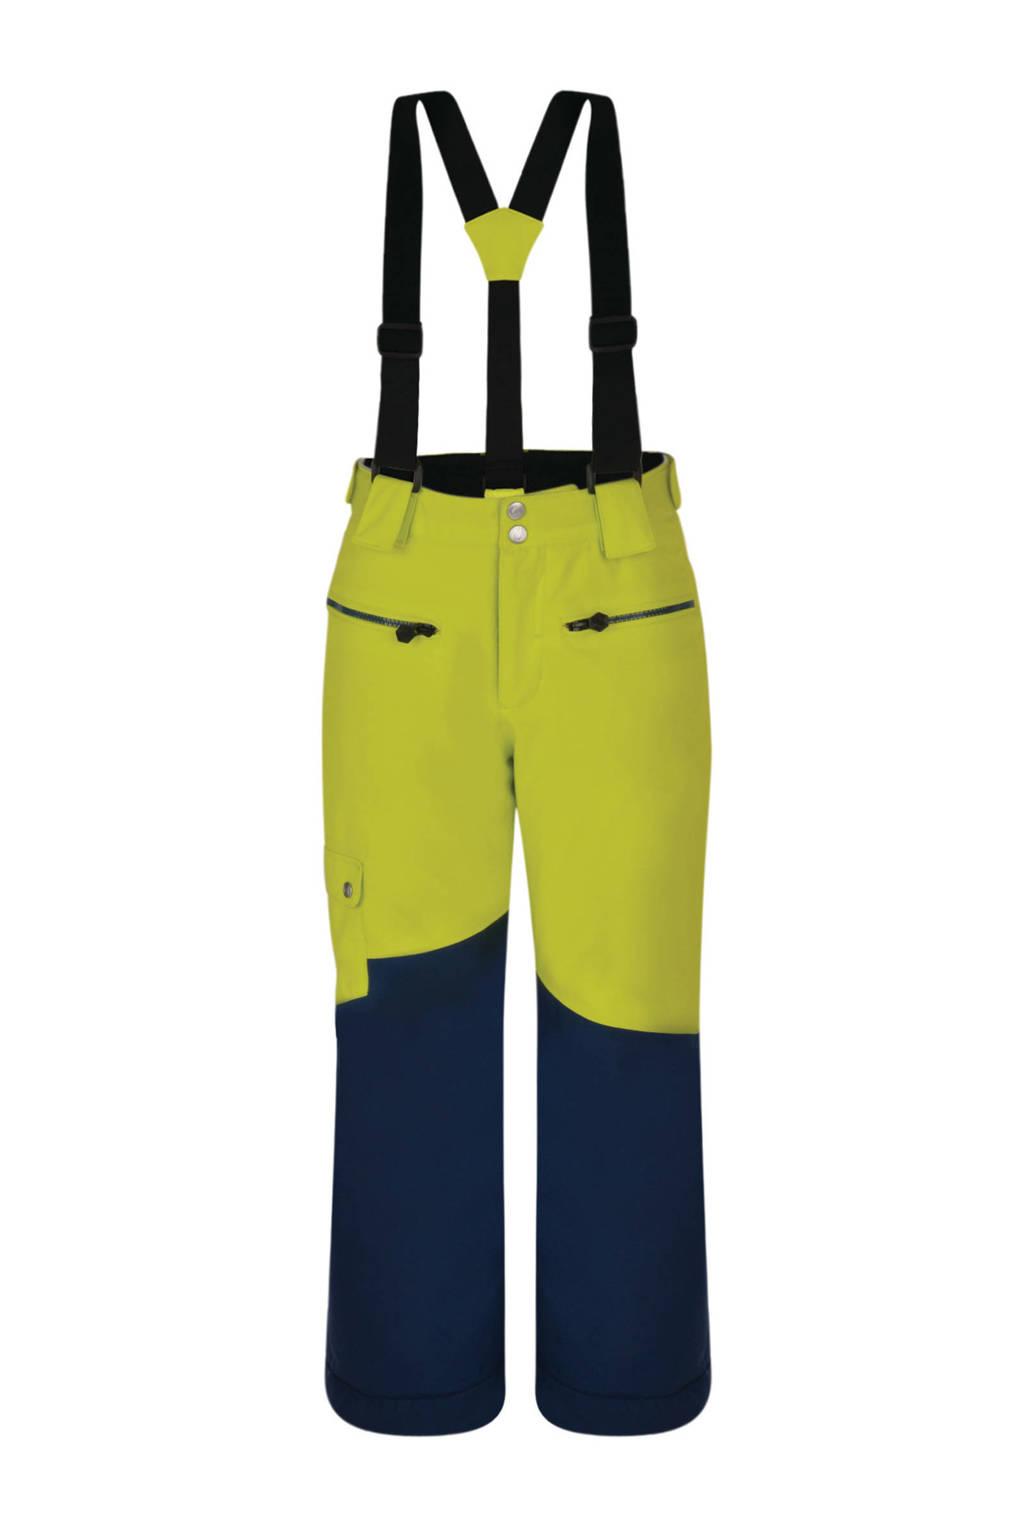 Dare2B skibroek Timeout limegroen/blauw, Limegroen/blauw